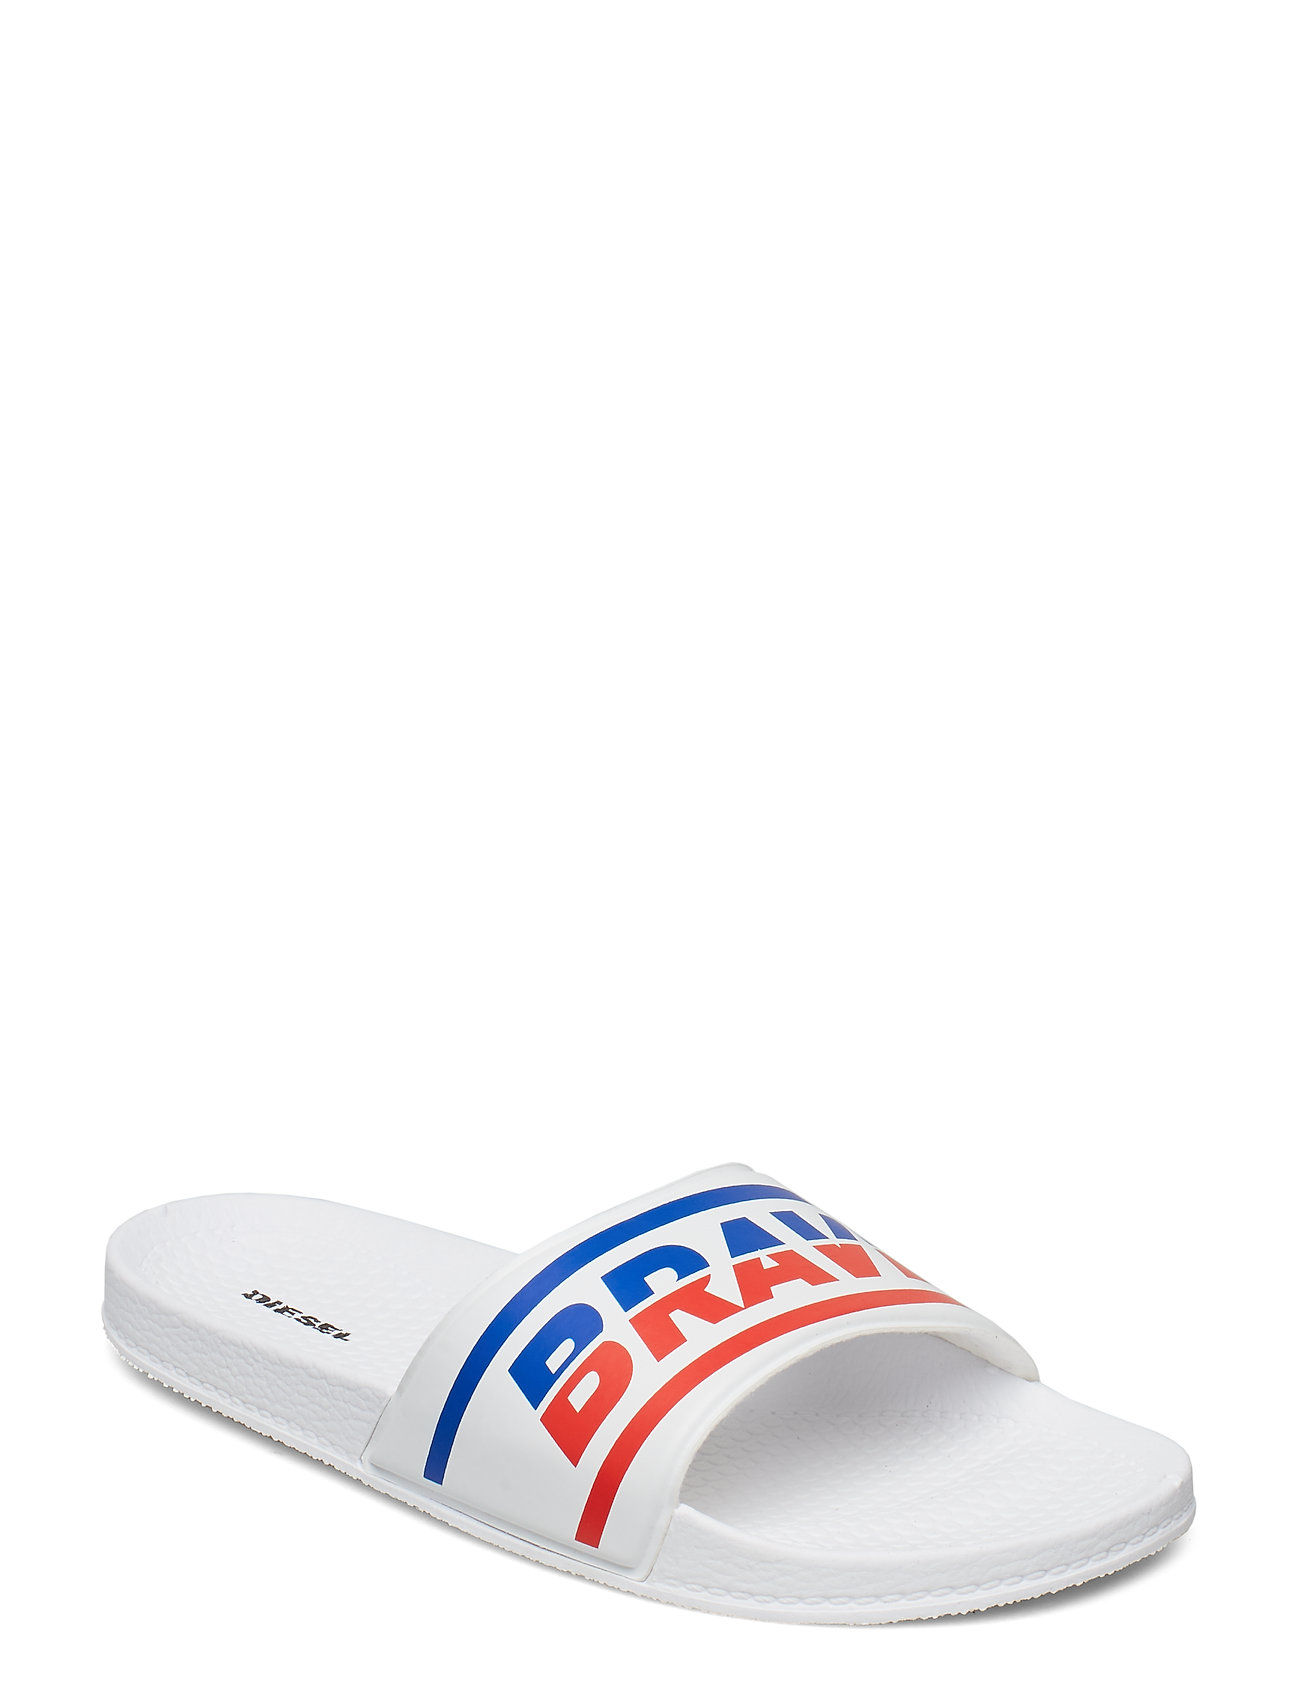 Image of A-Lohaa Ff 01 Slipper Yo - Slide (3110999005)